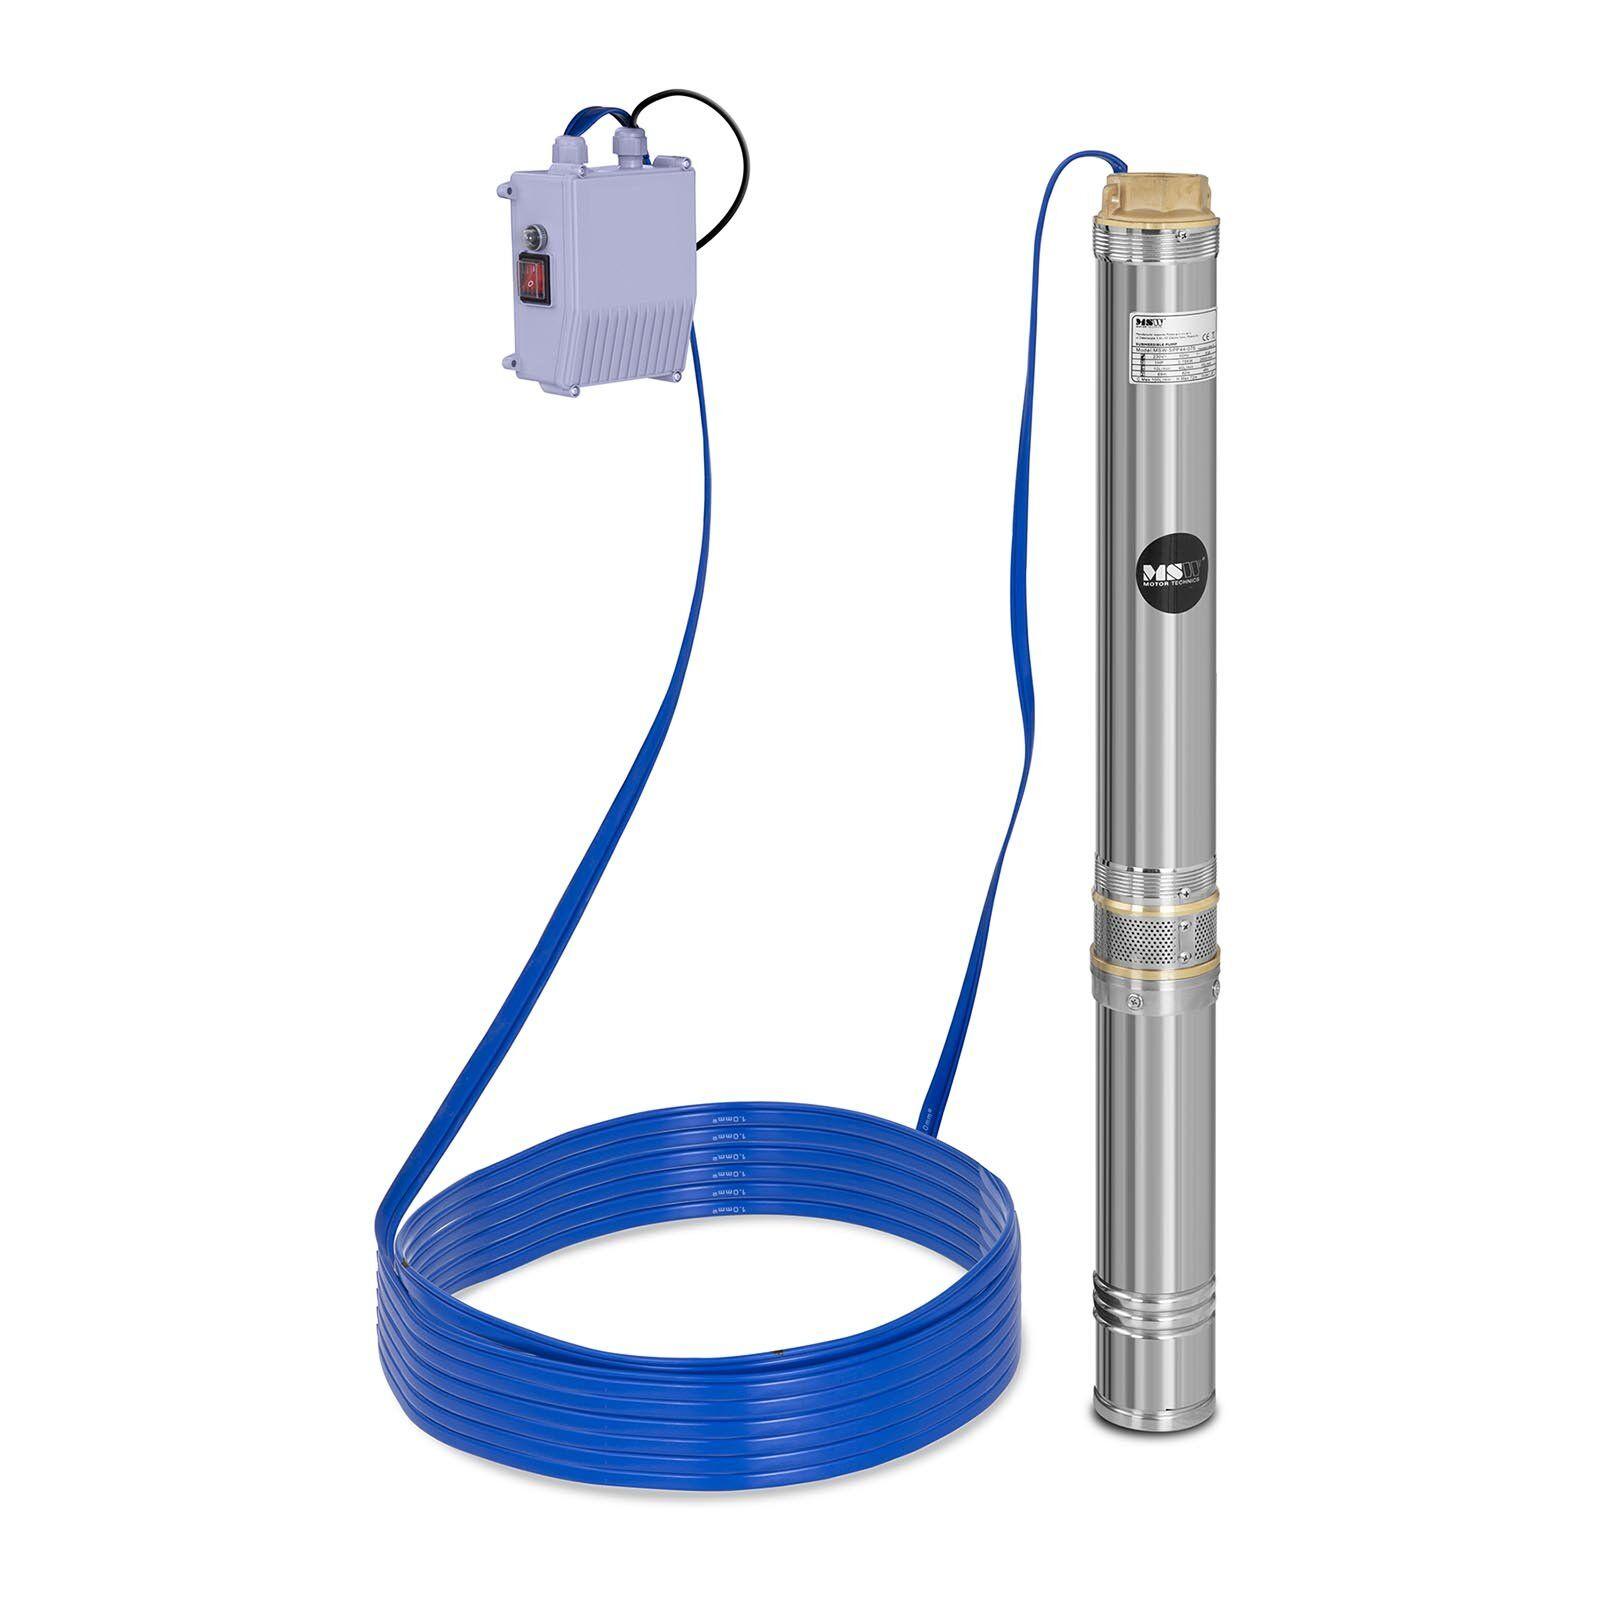 MSW Pompe immergée - 10 800 L/h - 1 100 W - acier inoxydable MSW-SPP48-110